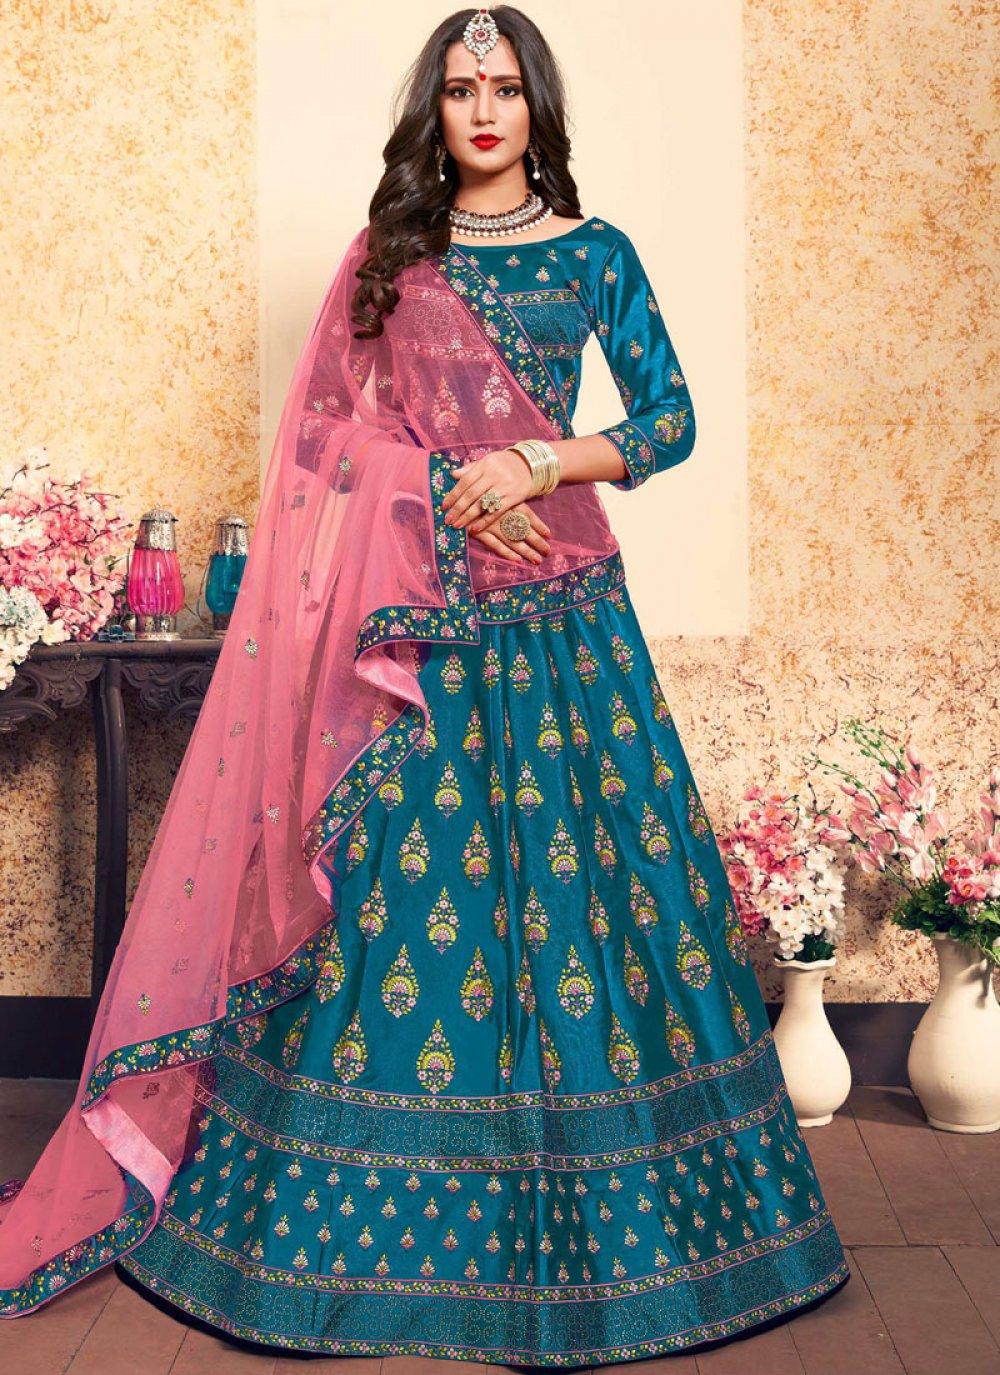 Stone Satin Trendy Lehenga Choli in Blue